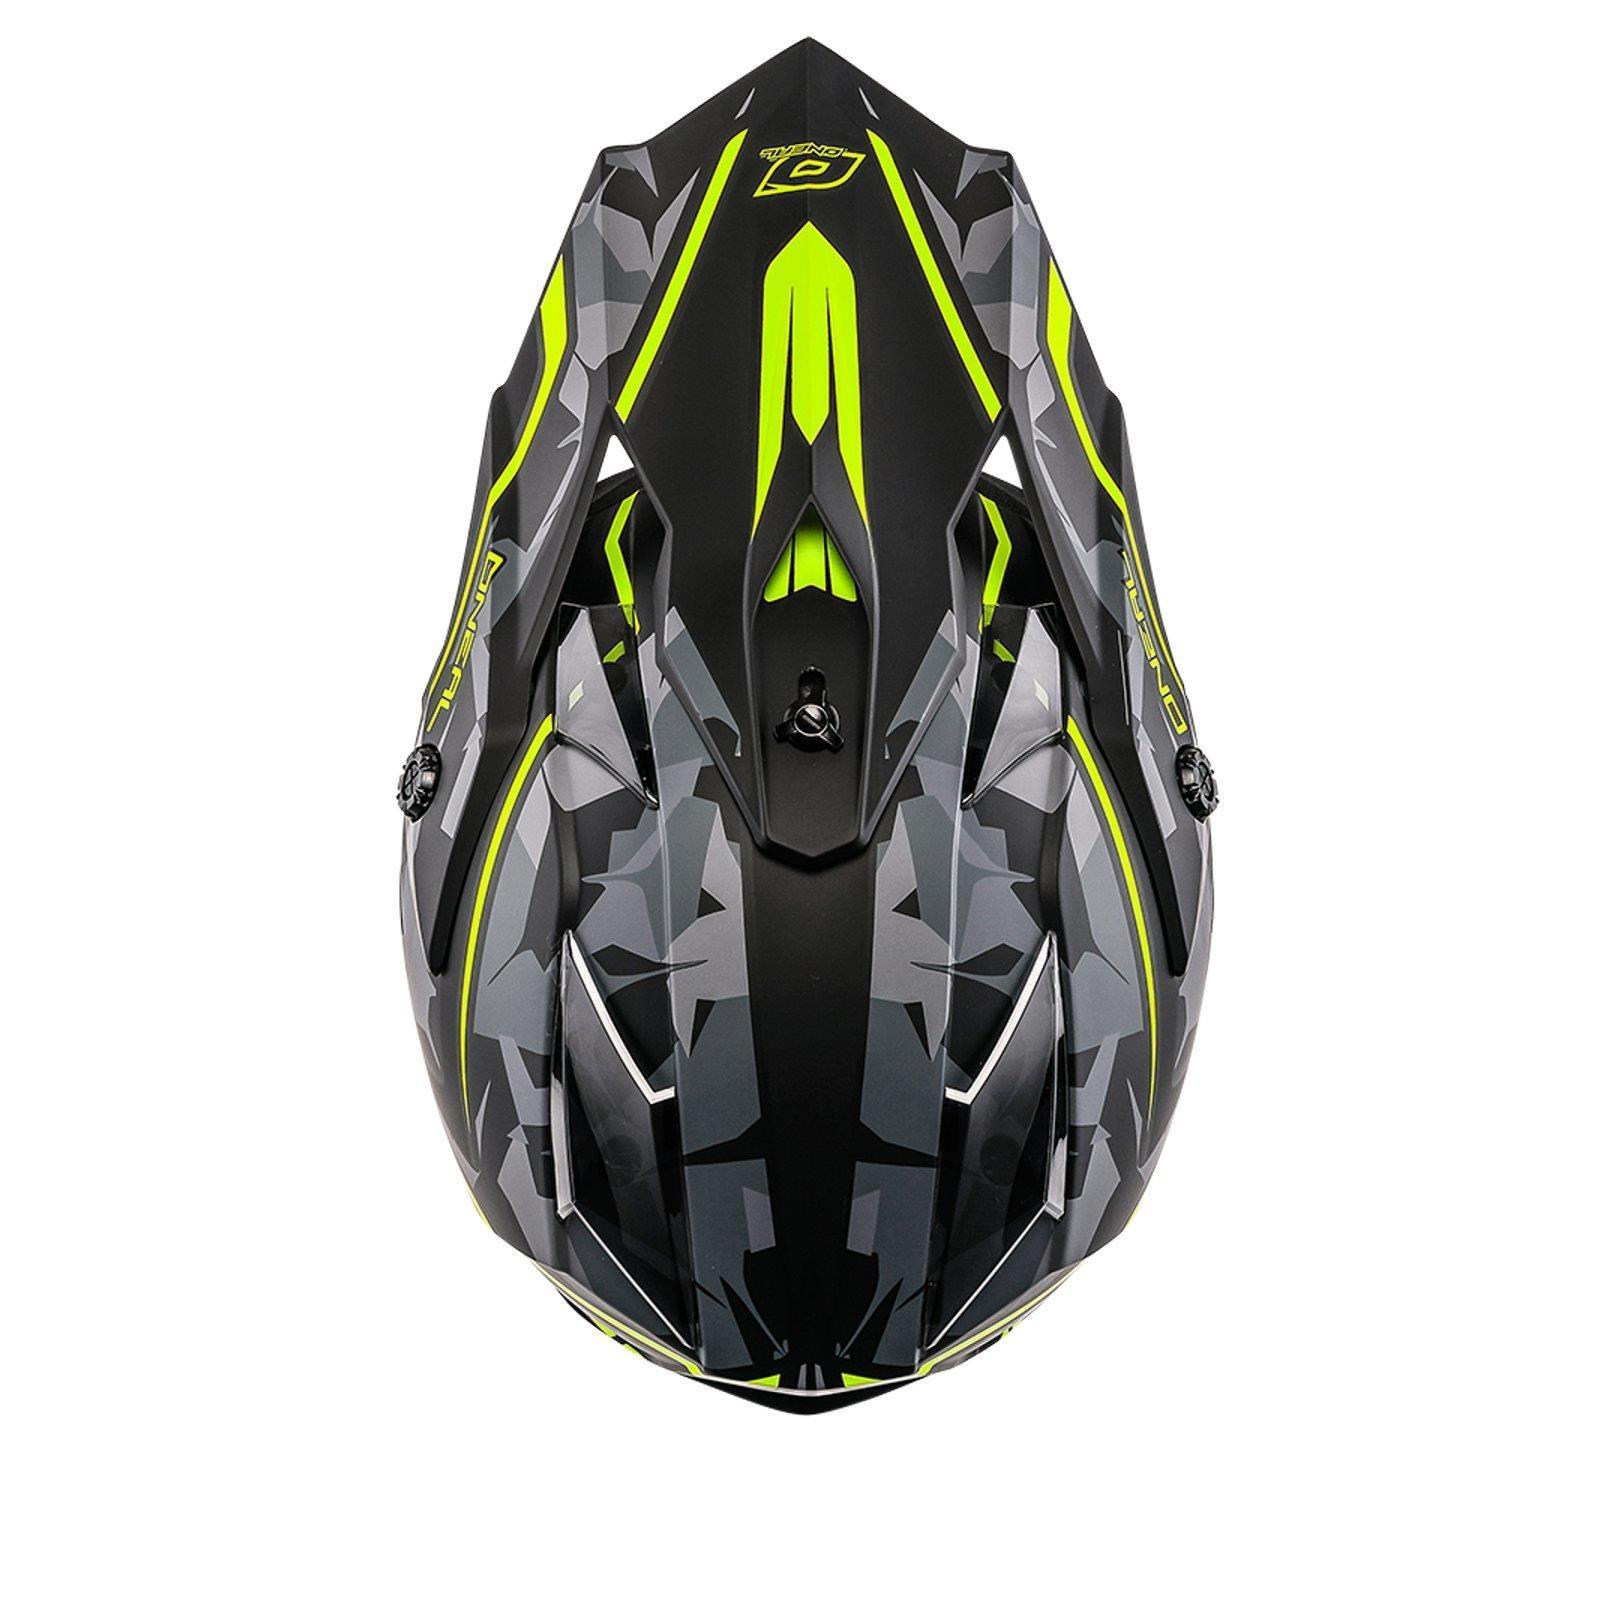 ONeal-Motocross-casco-MX-ENDURO-MOTO-BICI-FUORISTRADA-CROSS-Series-Adventure miniatura 129